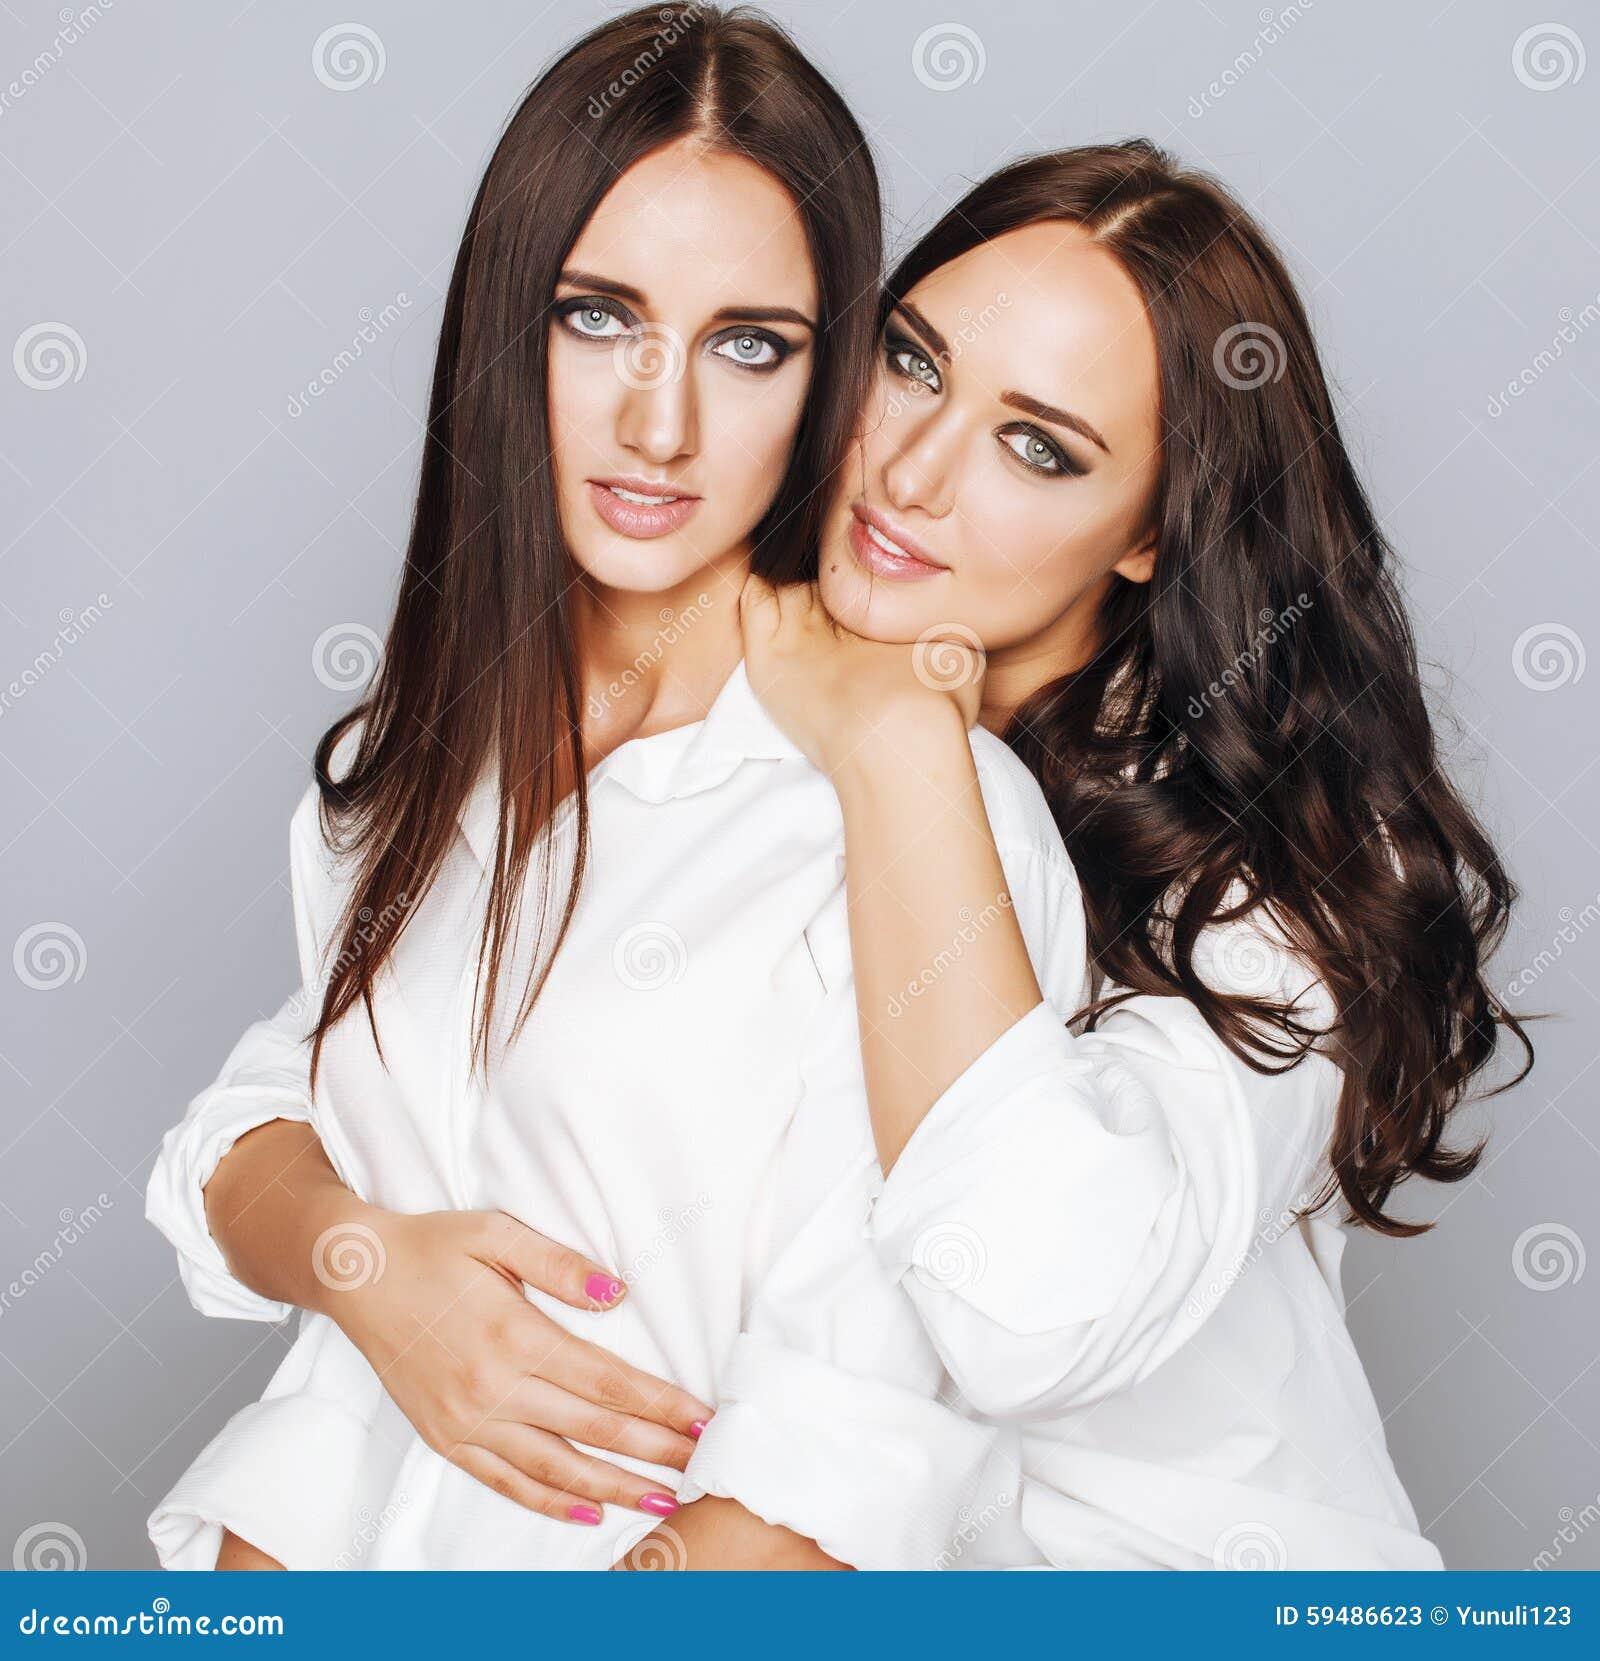 Filipino sisters posing at nudesapoppin 2012 4